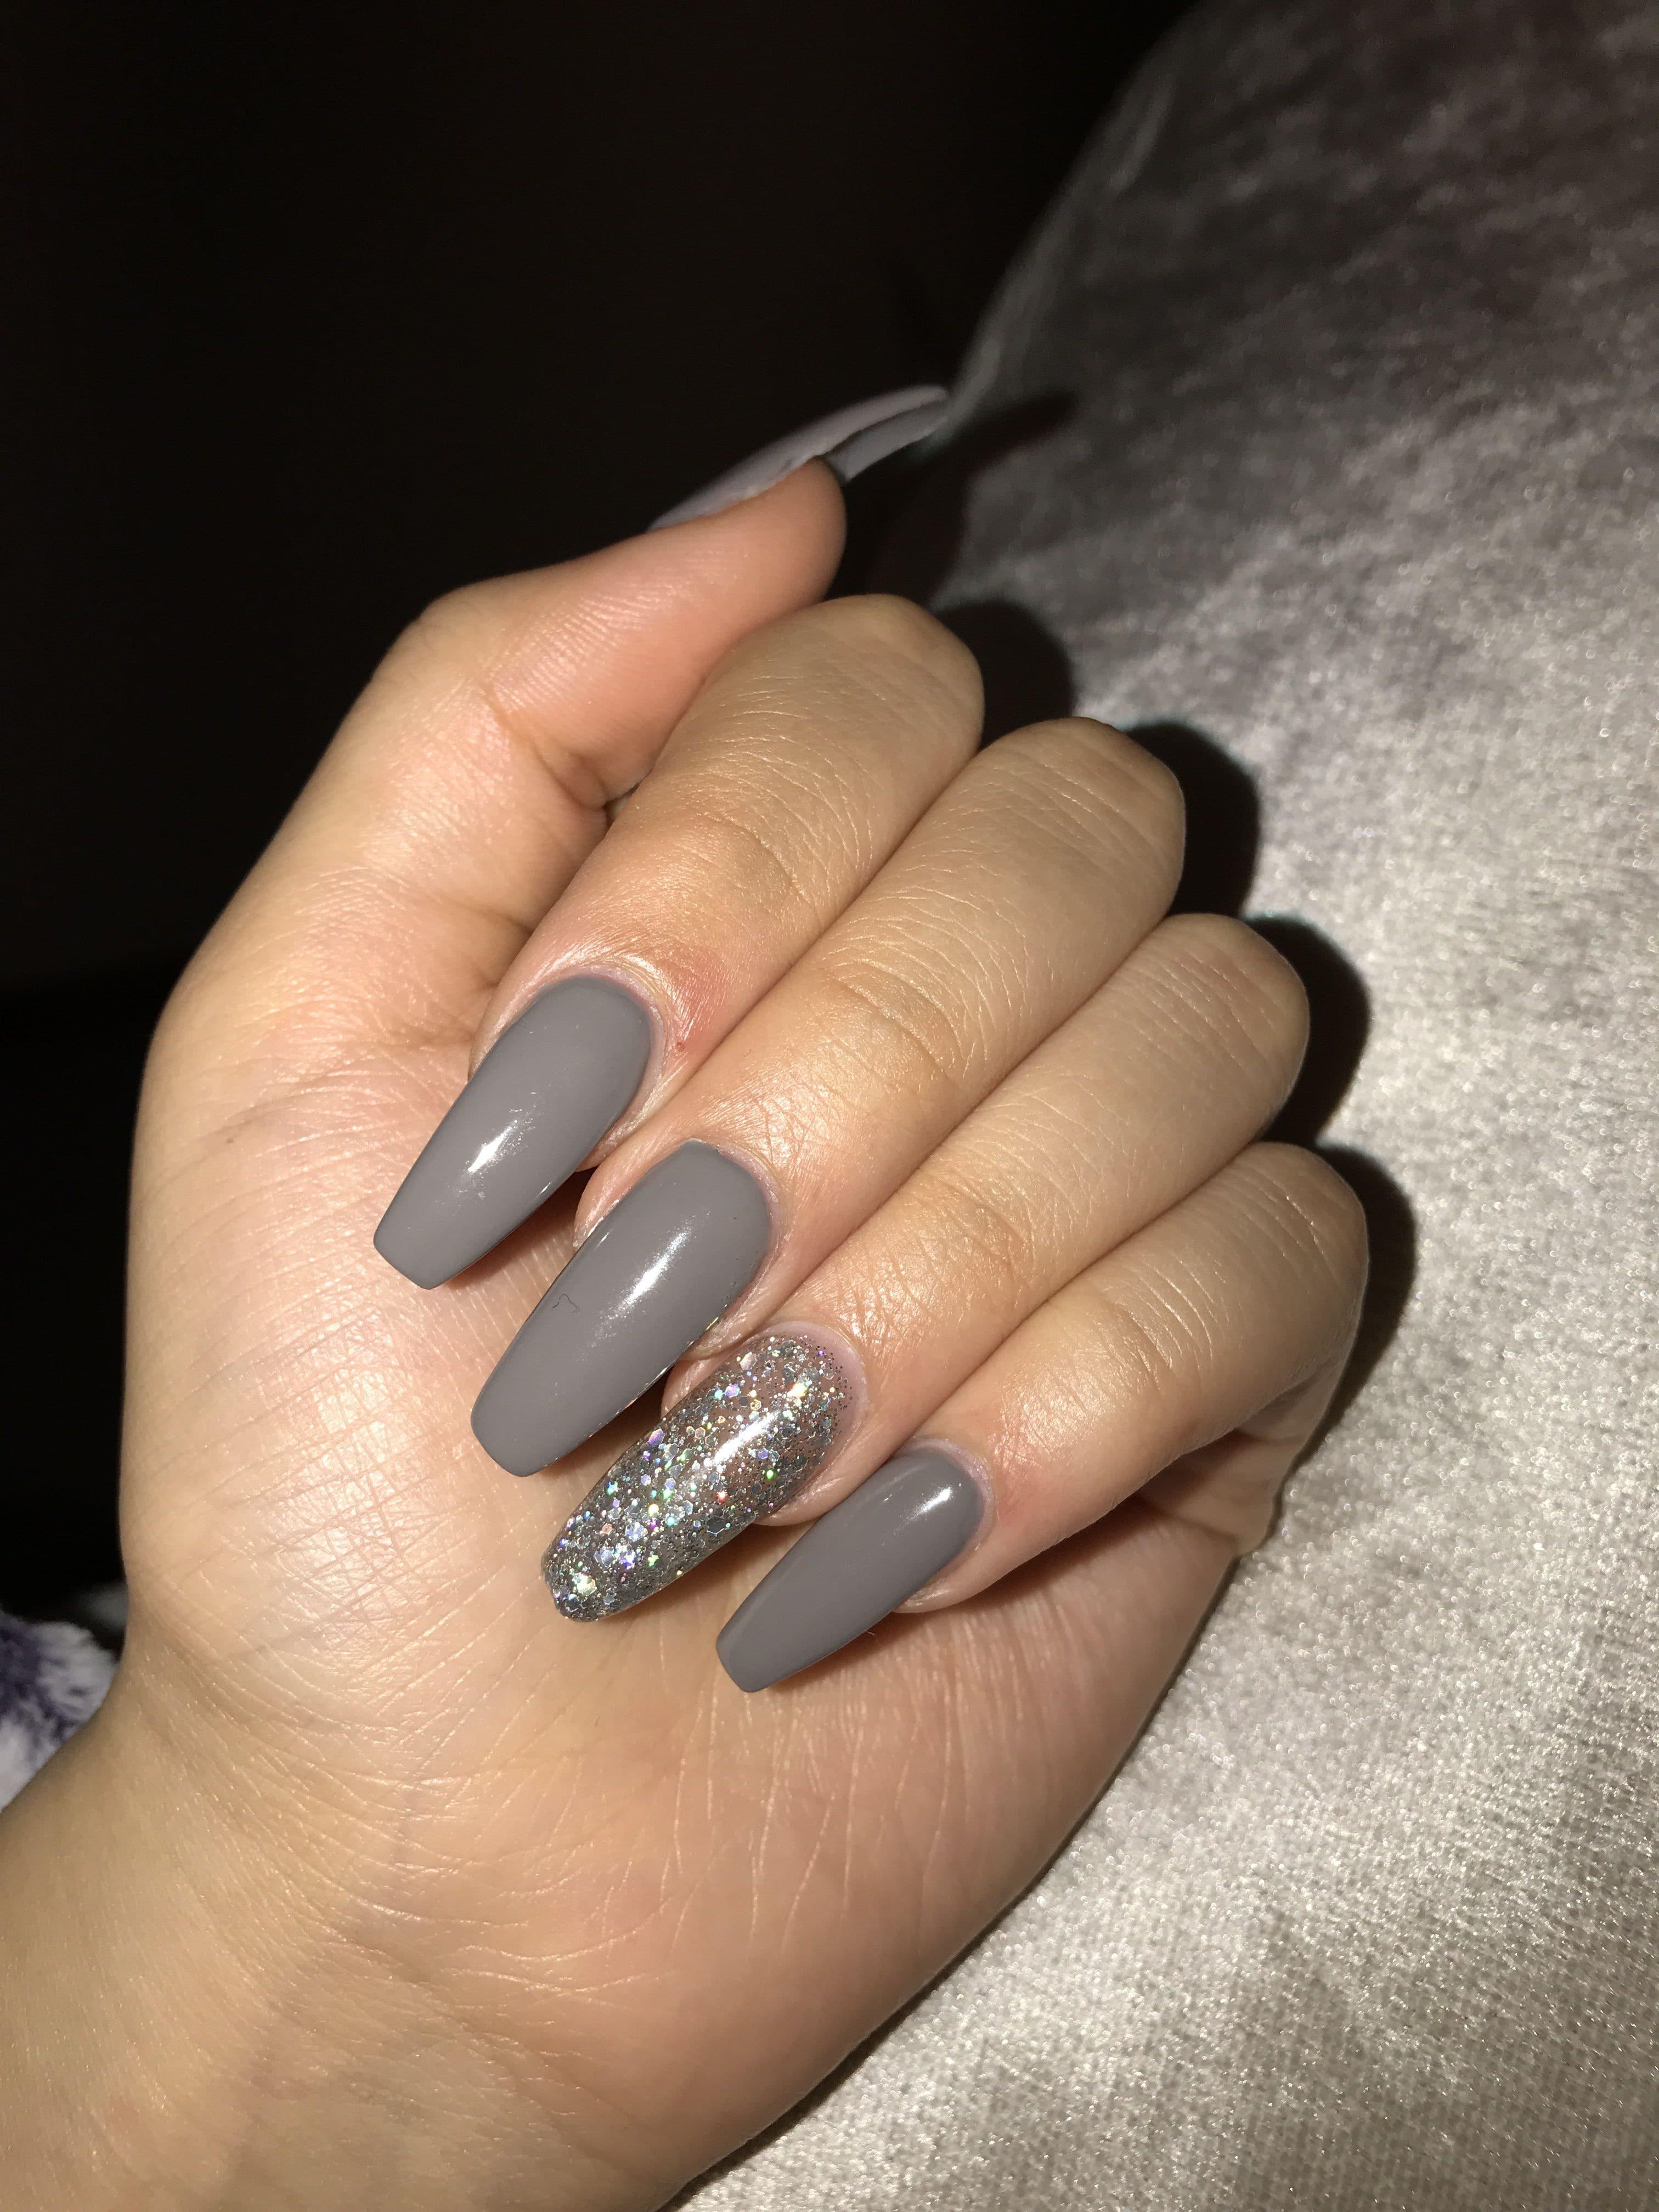 acrylic nails kylie jenner photo - 2